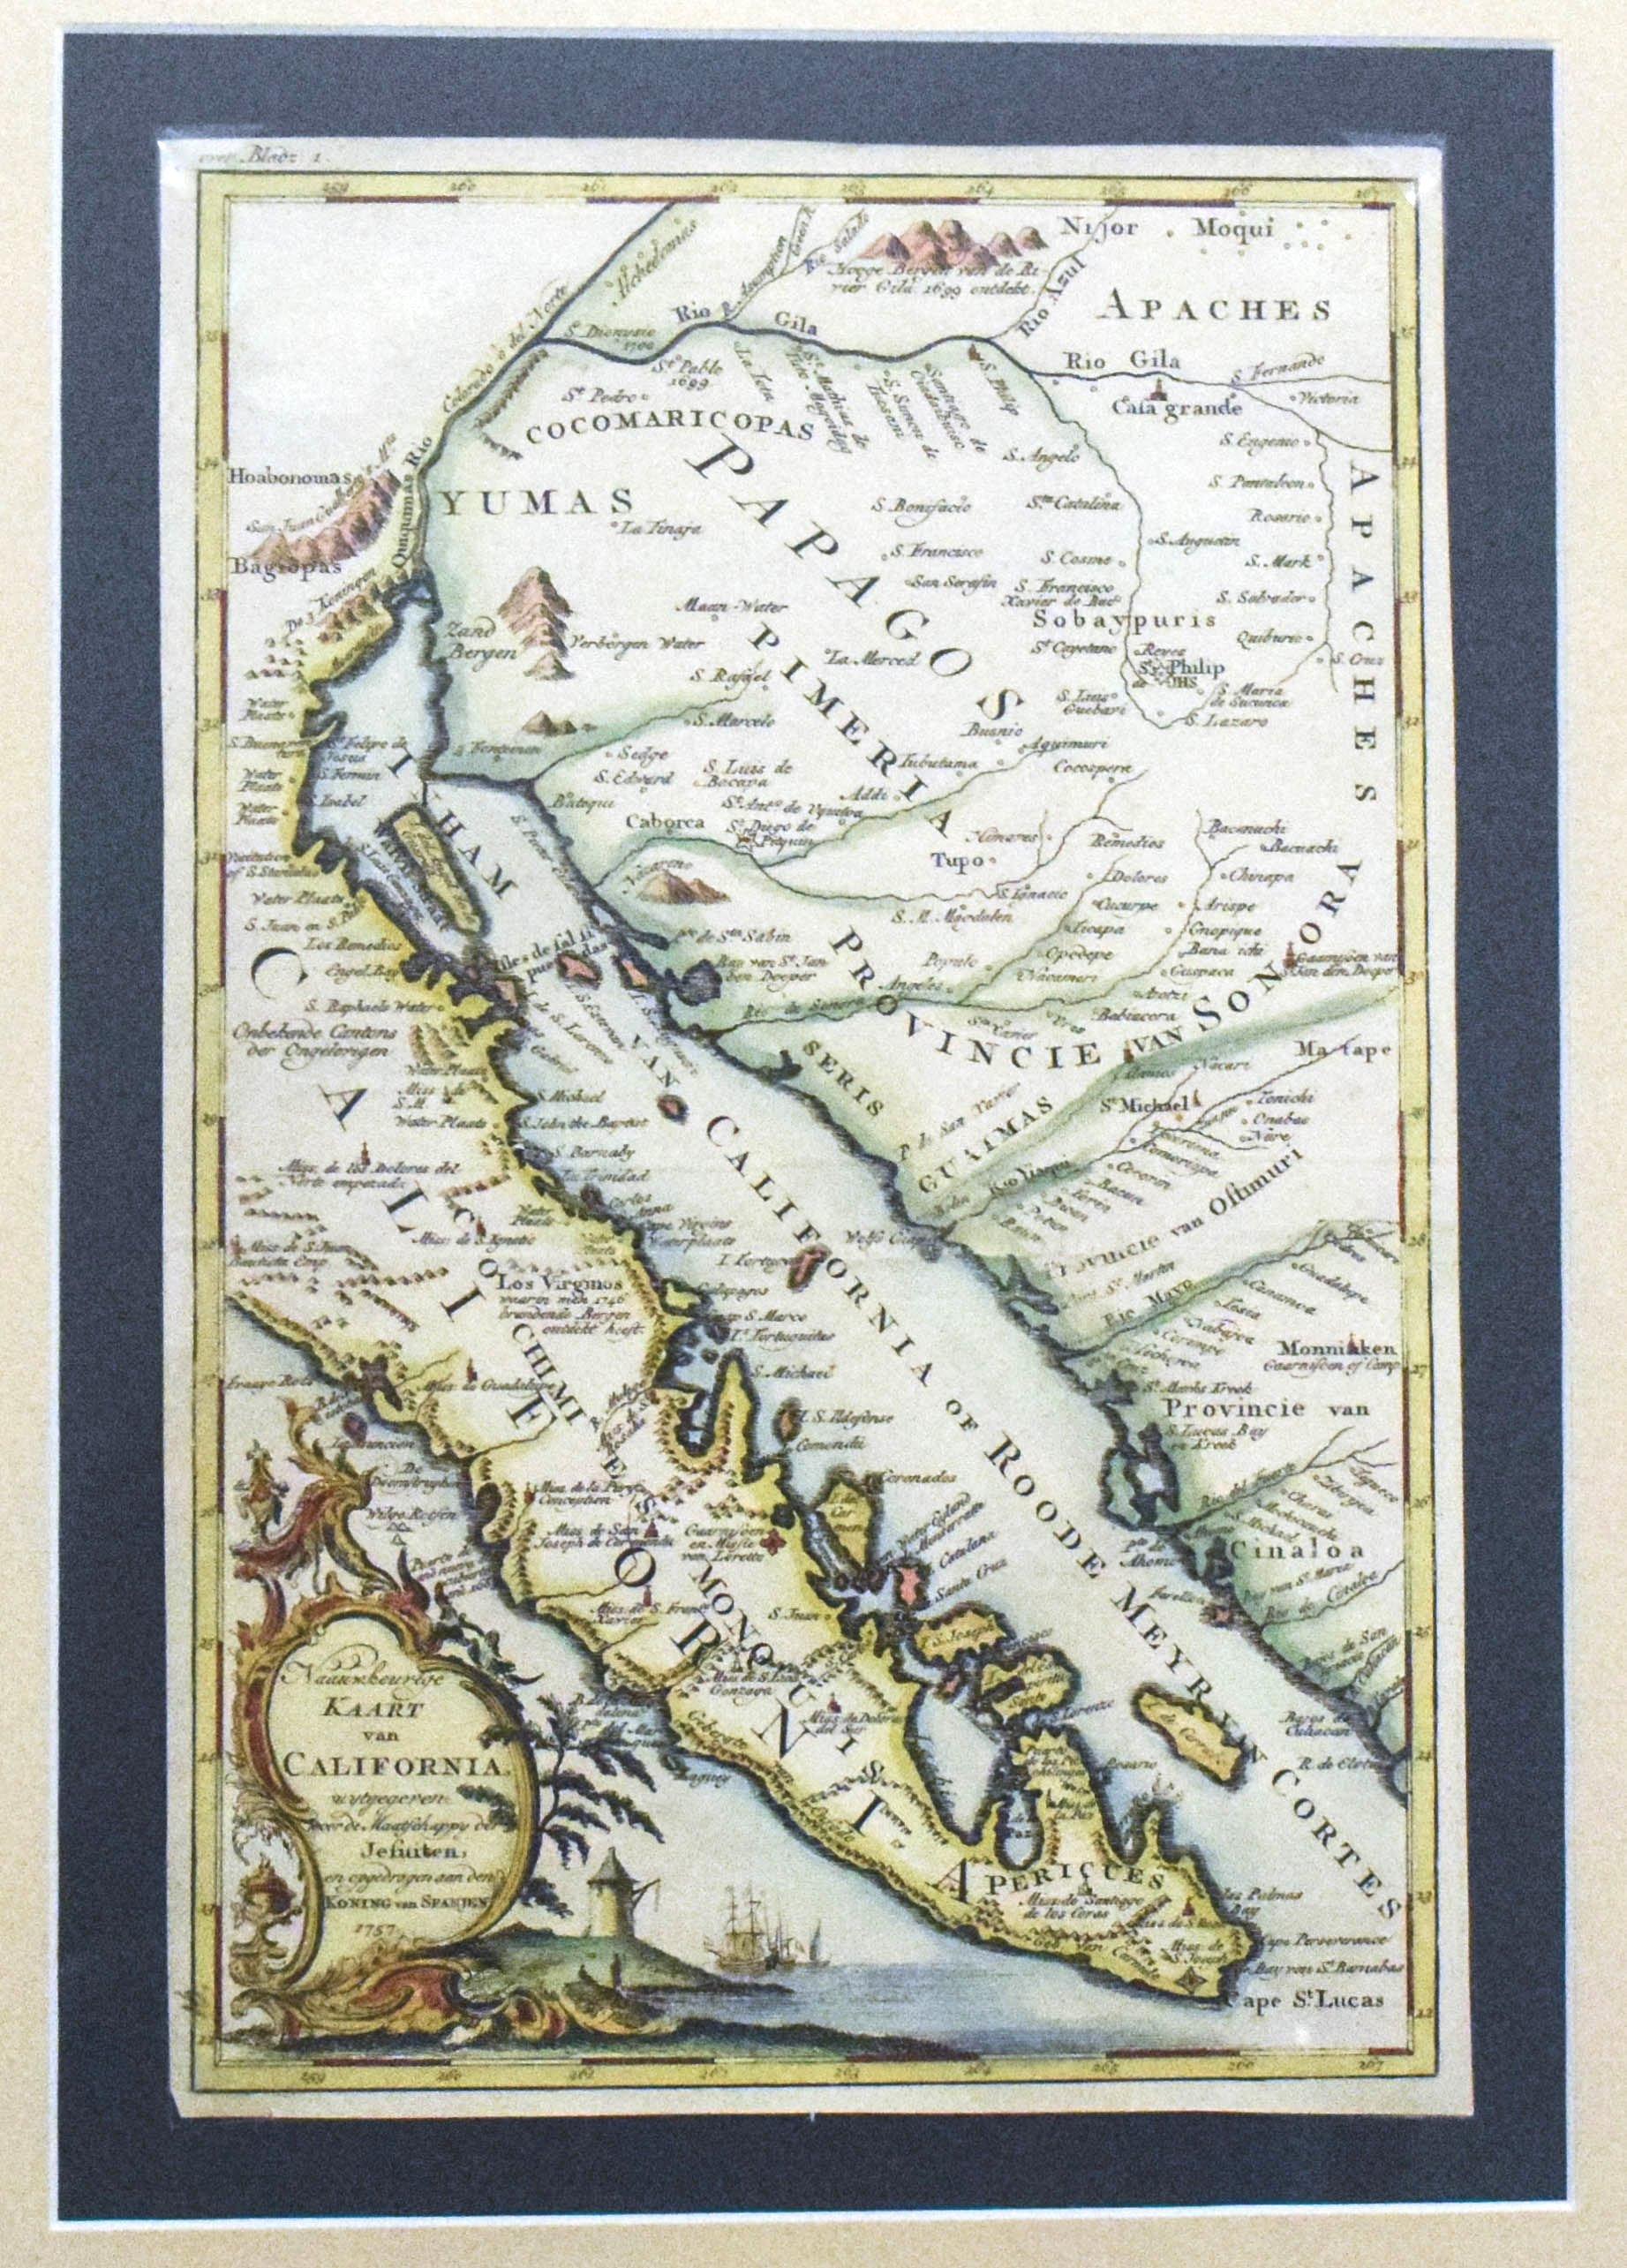 Missions In Southern California Map.1757 Venegas Impactful Map Of Baja California